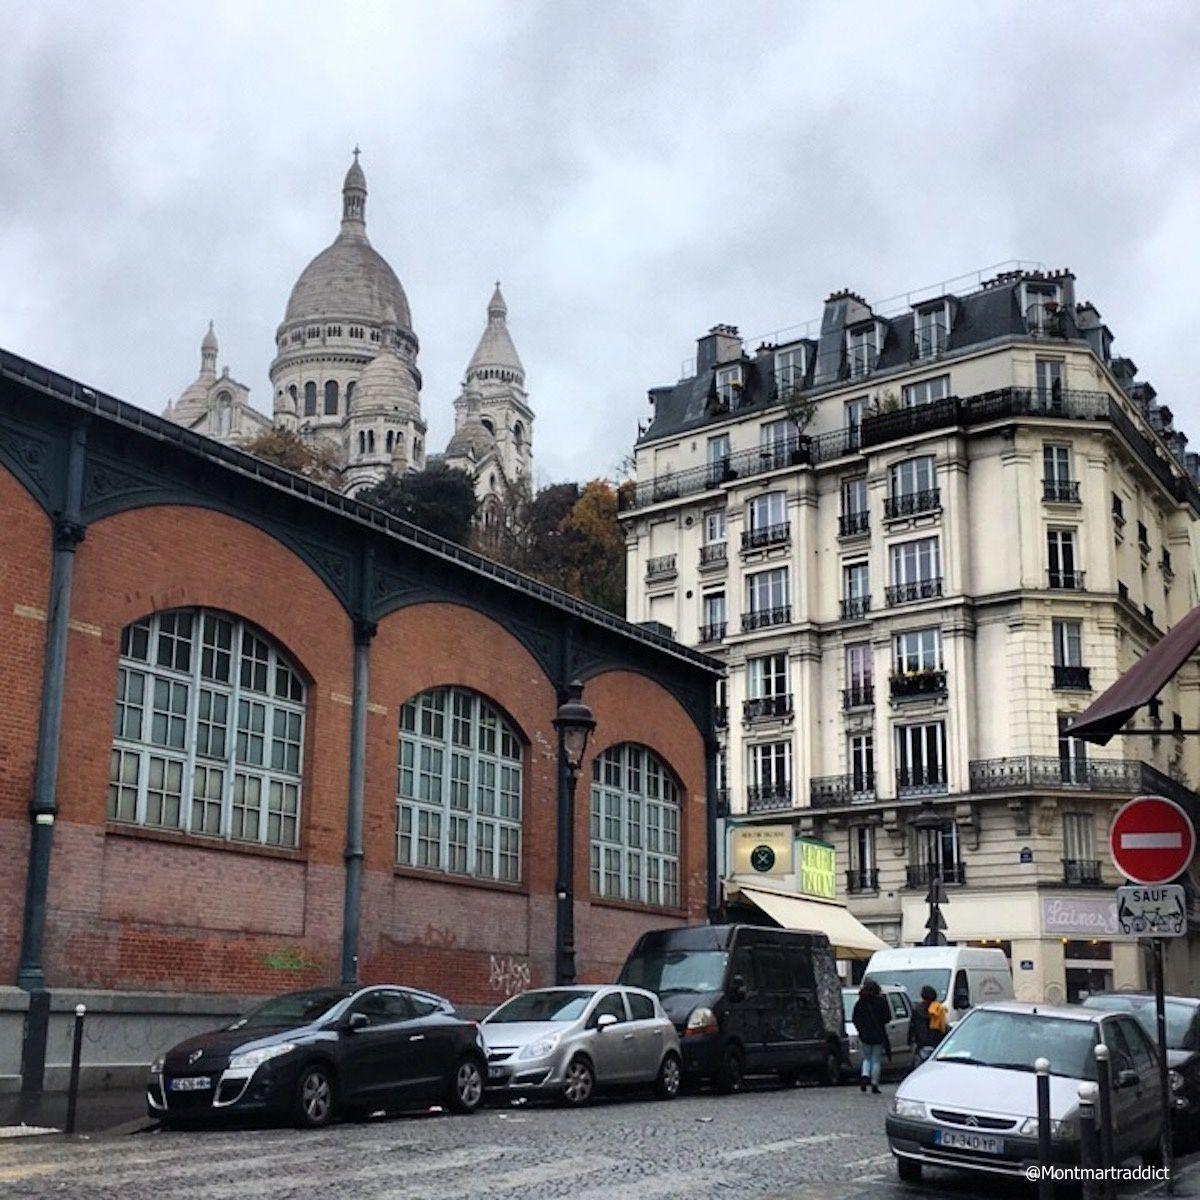 05. Rainy samedi, Montmartre 75018